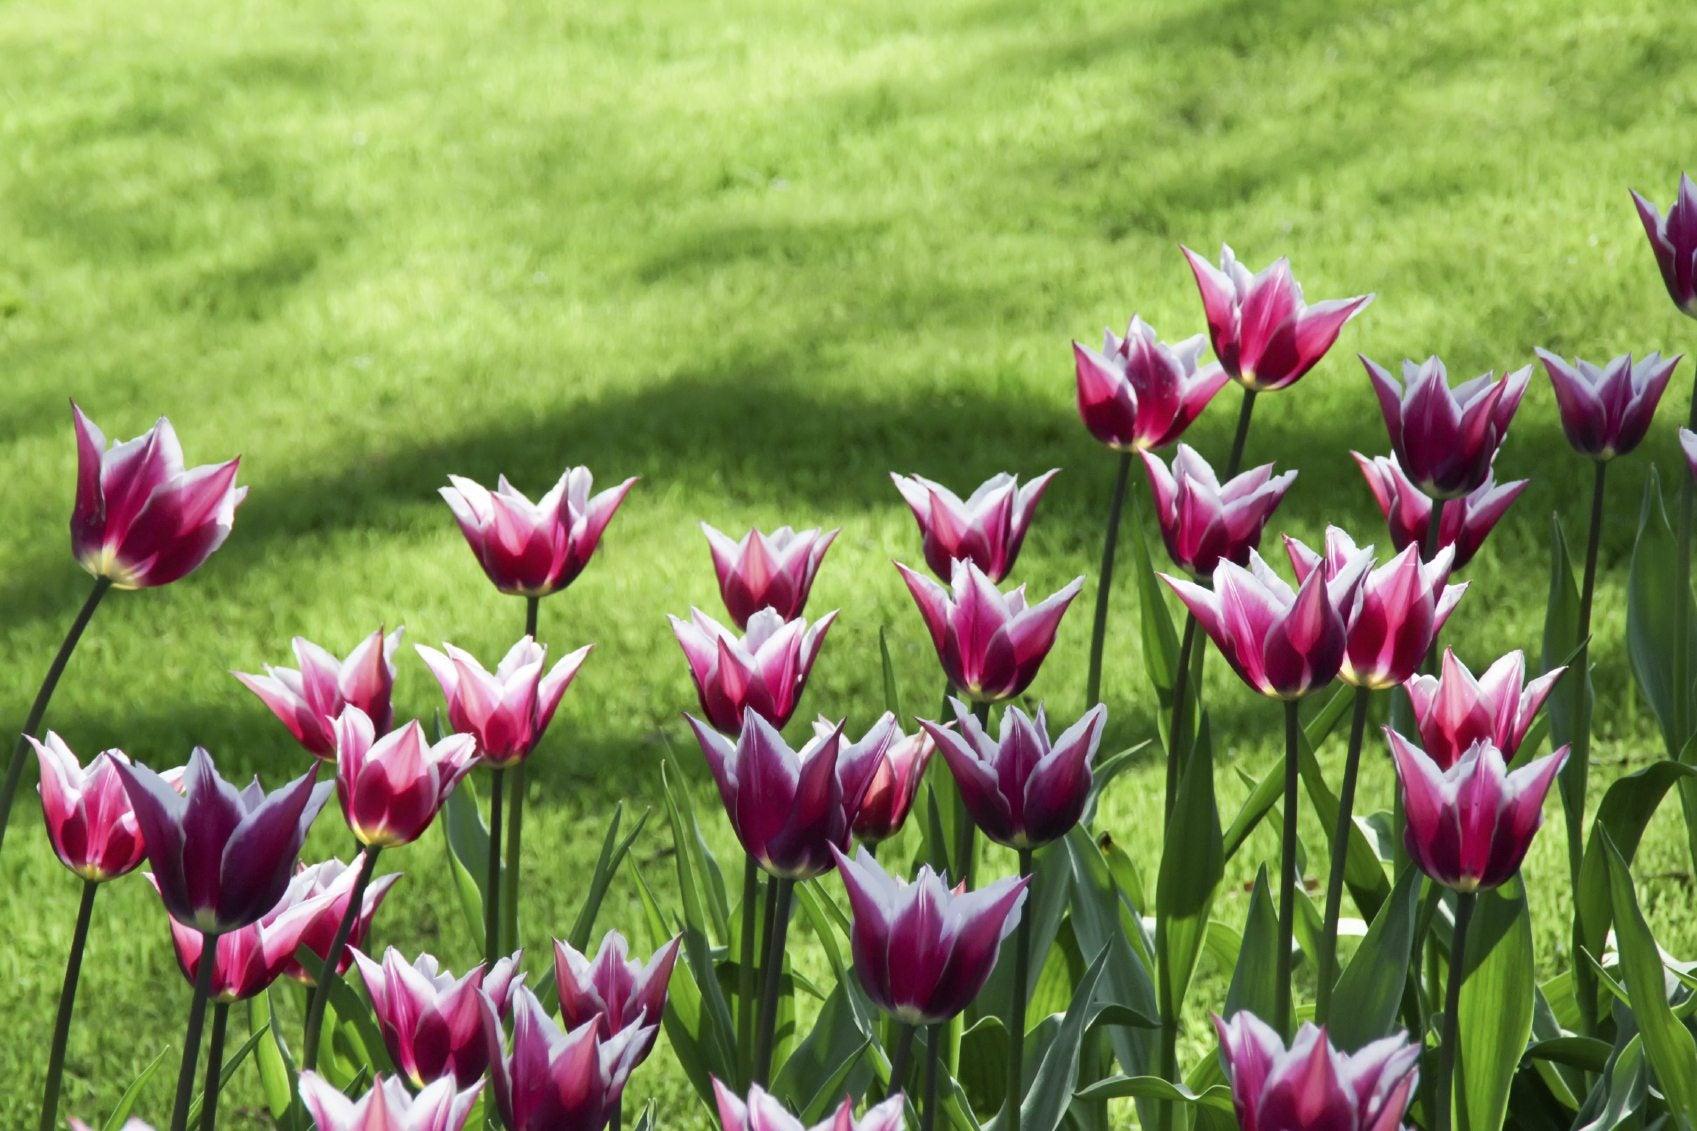 Preventing Deer From Eating Tulips